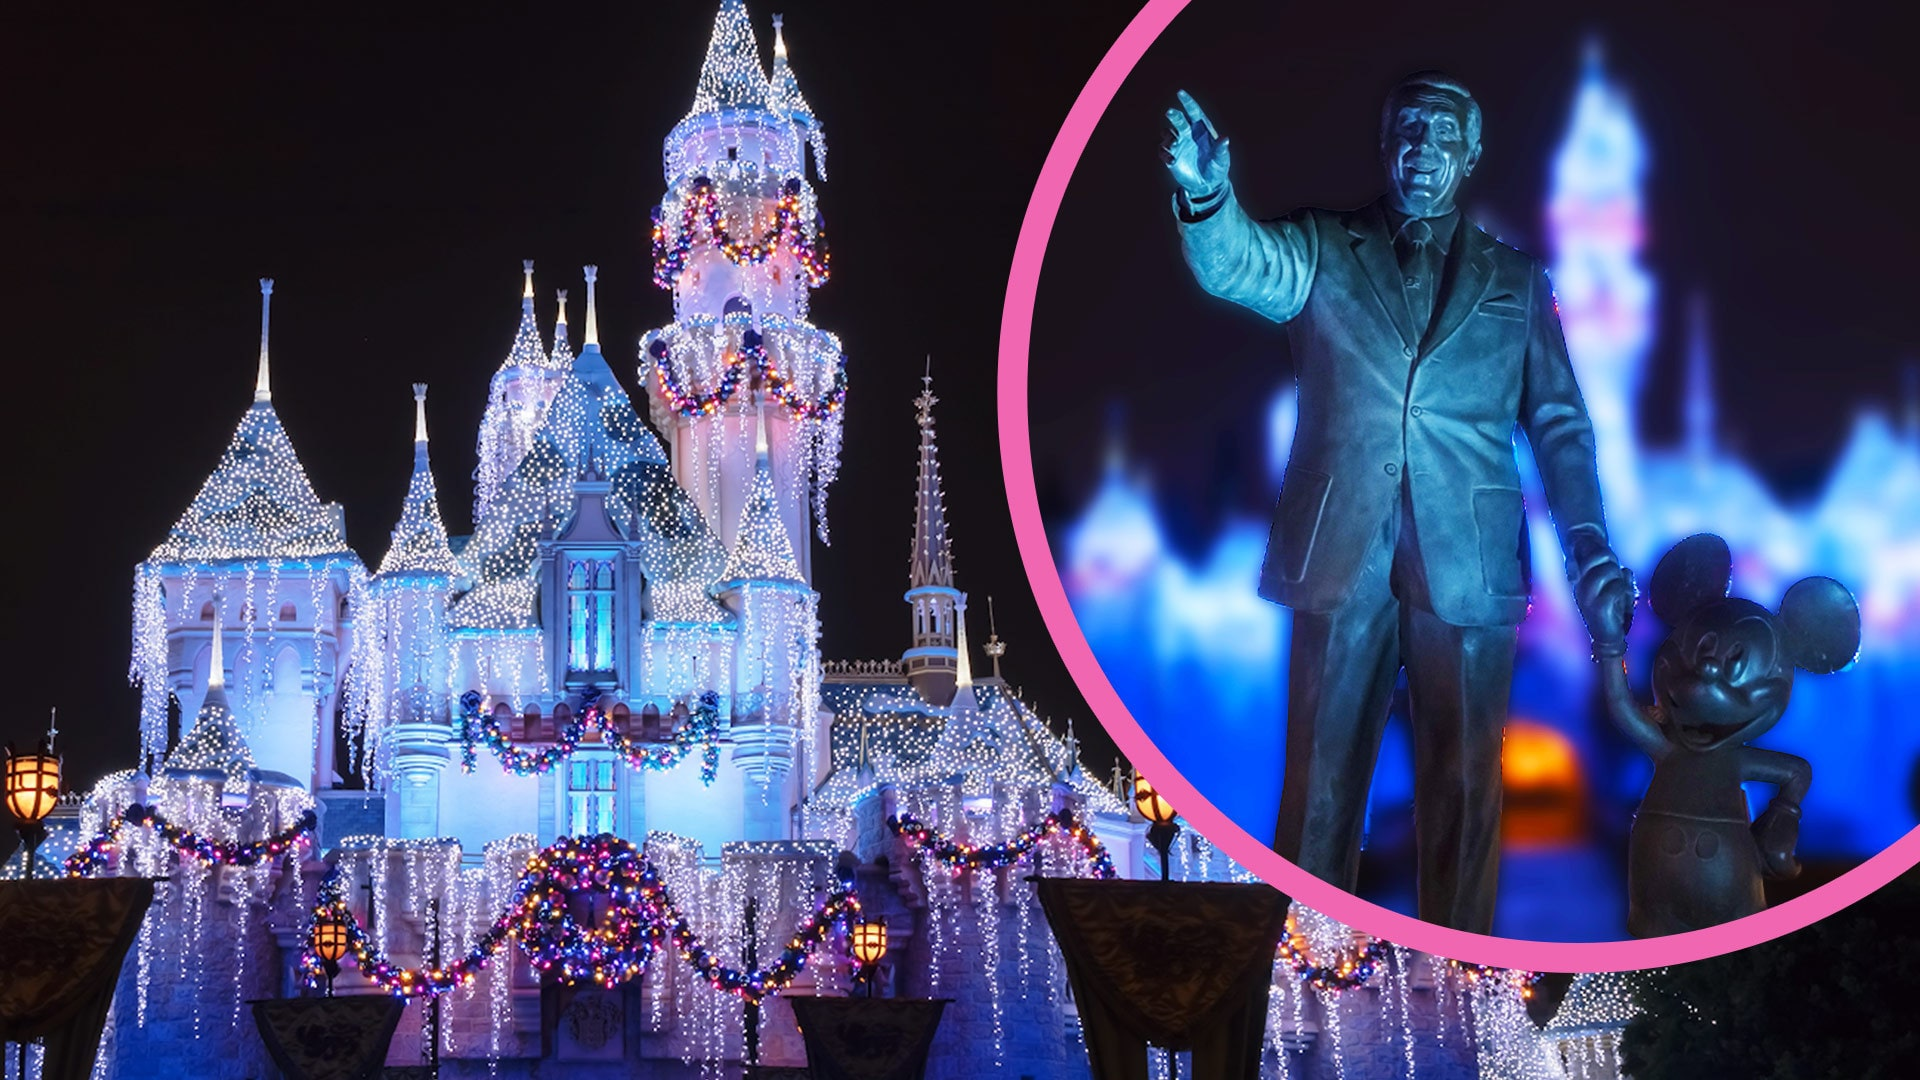 Sleeping Beauty Castle Holiday Transformation at Disneyland | Oh My Disney